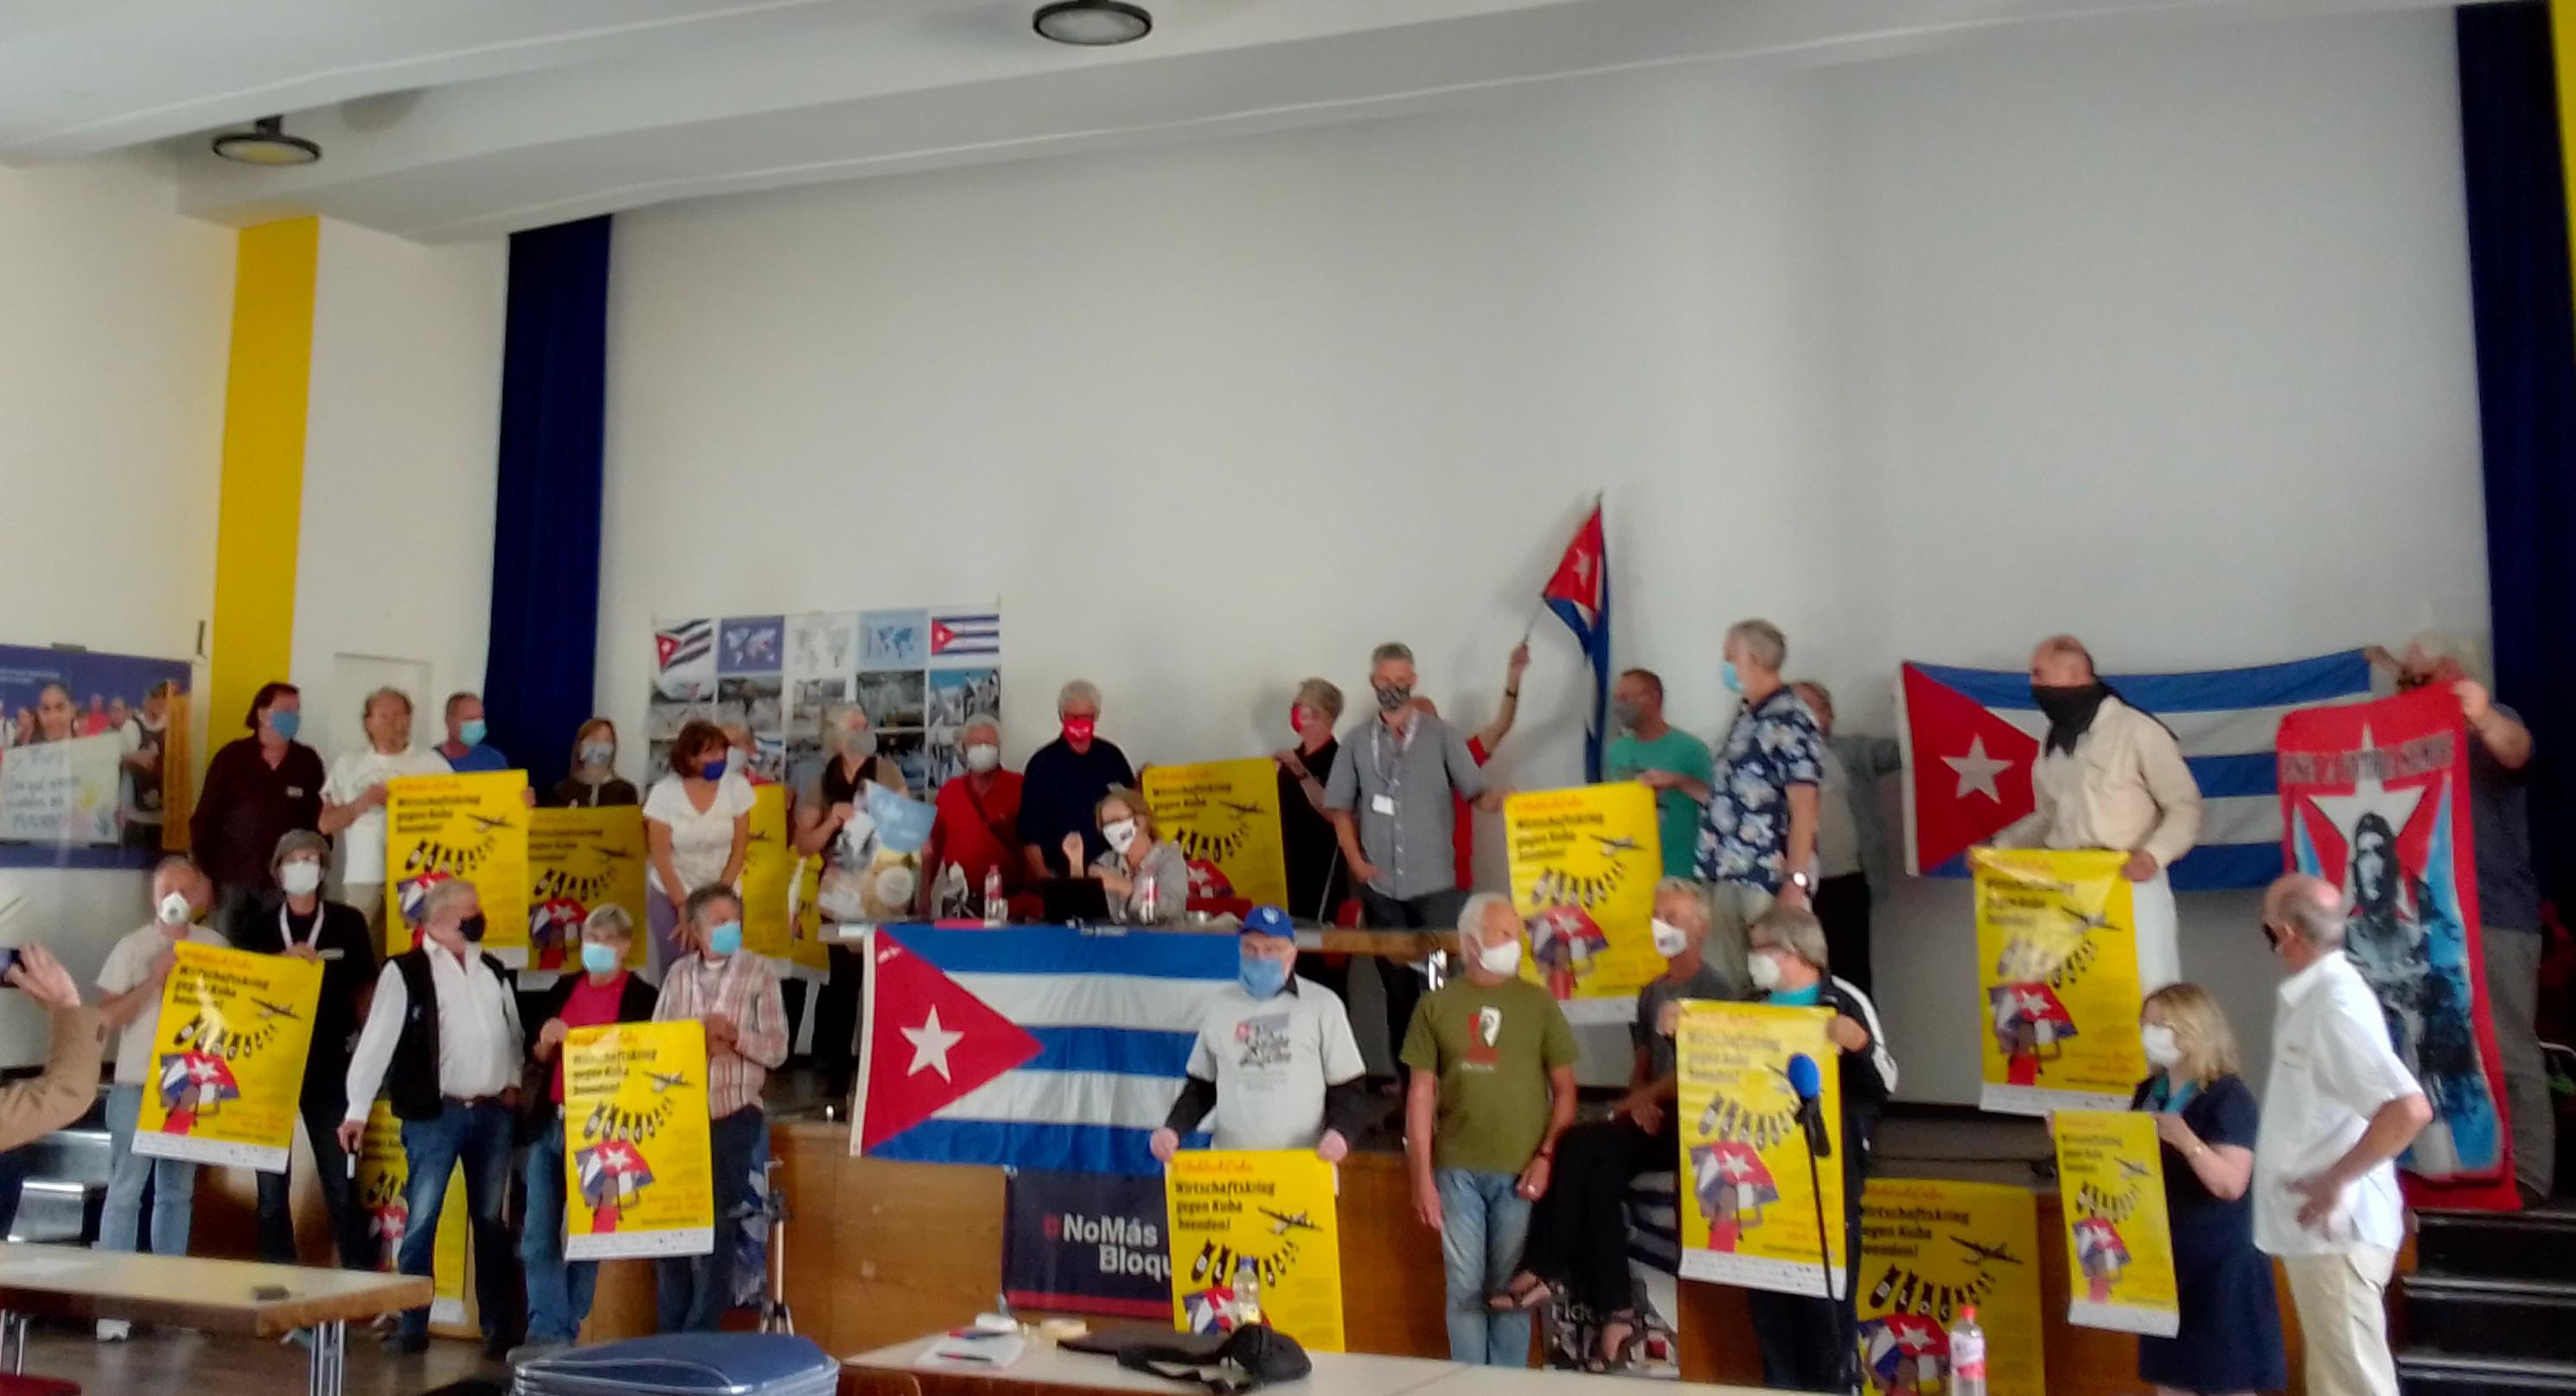 Bundesdelegiertenkonferenz der Freundschaftsgesellschaft BRD-Kuba